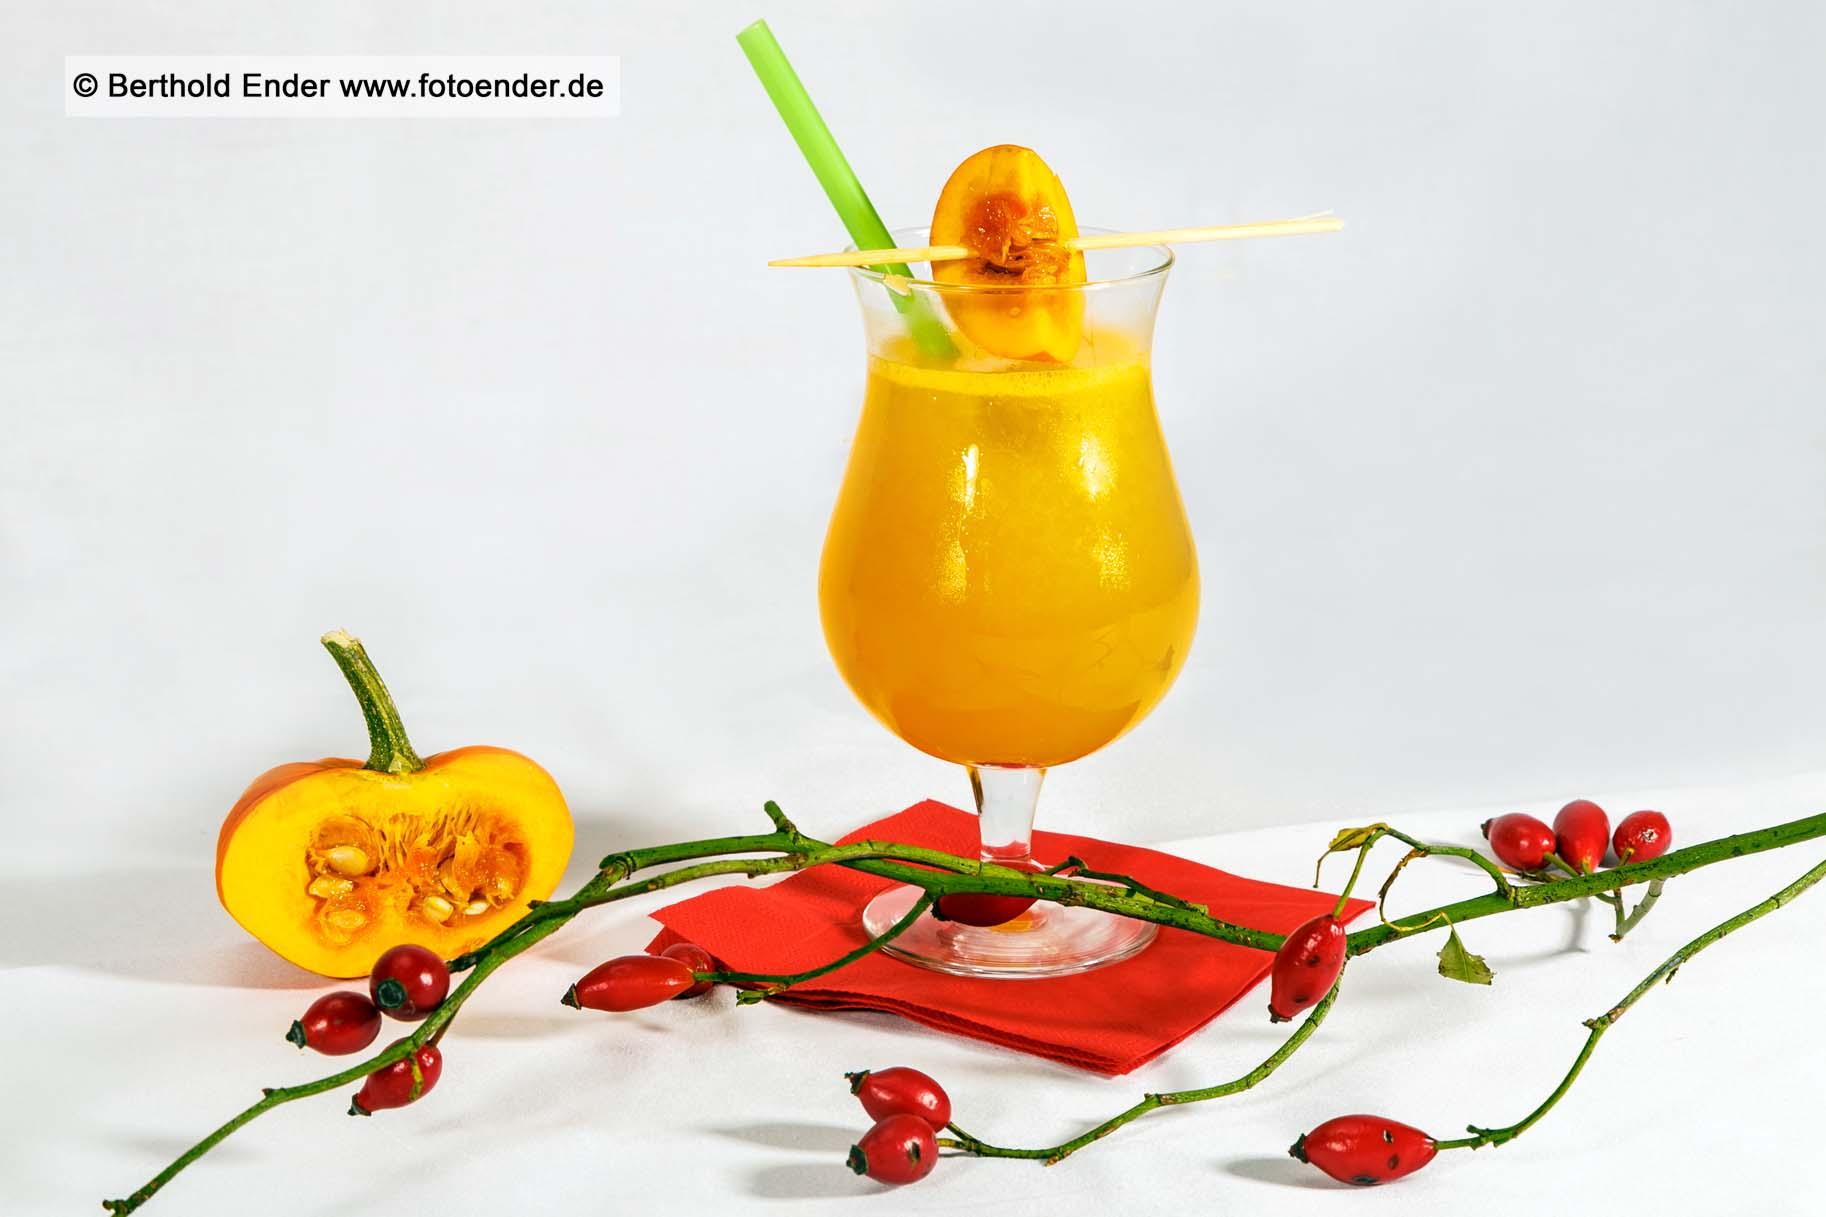 Produktfotografie-Food-Fotostudio Ender